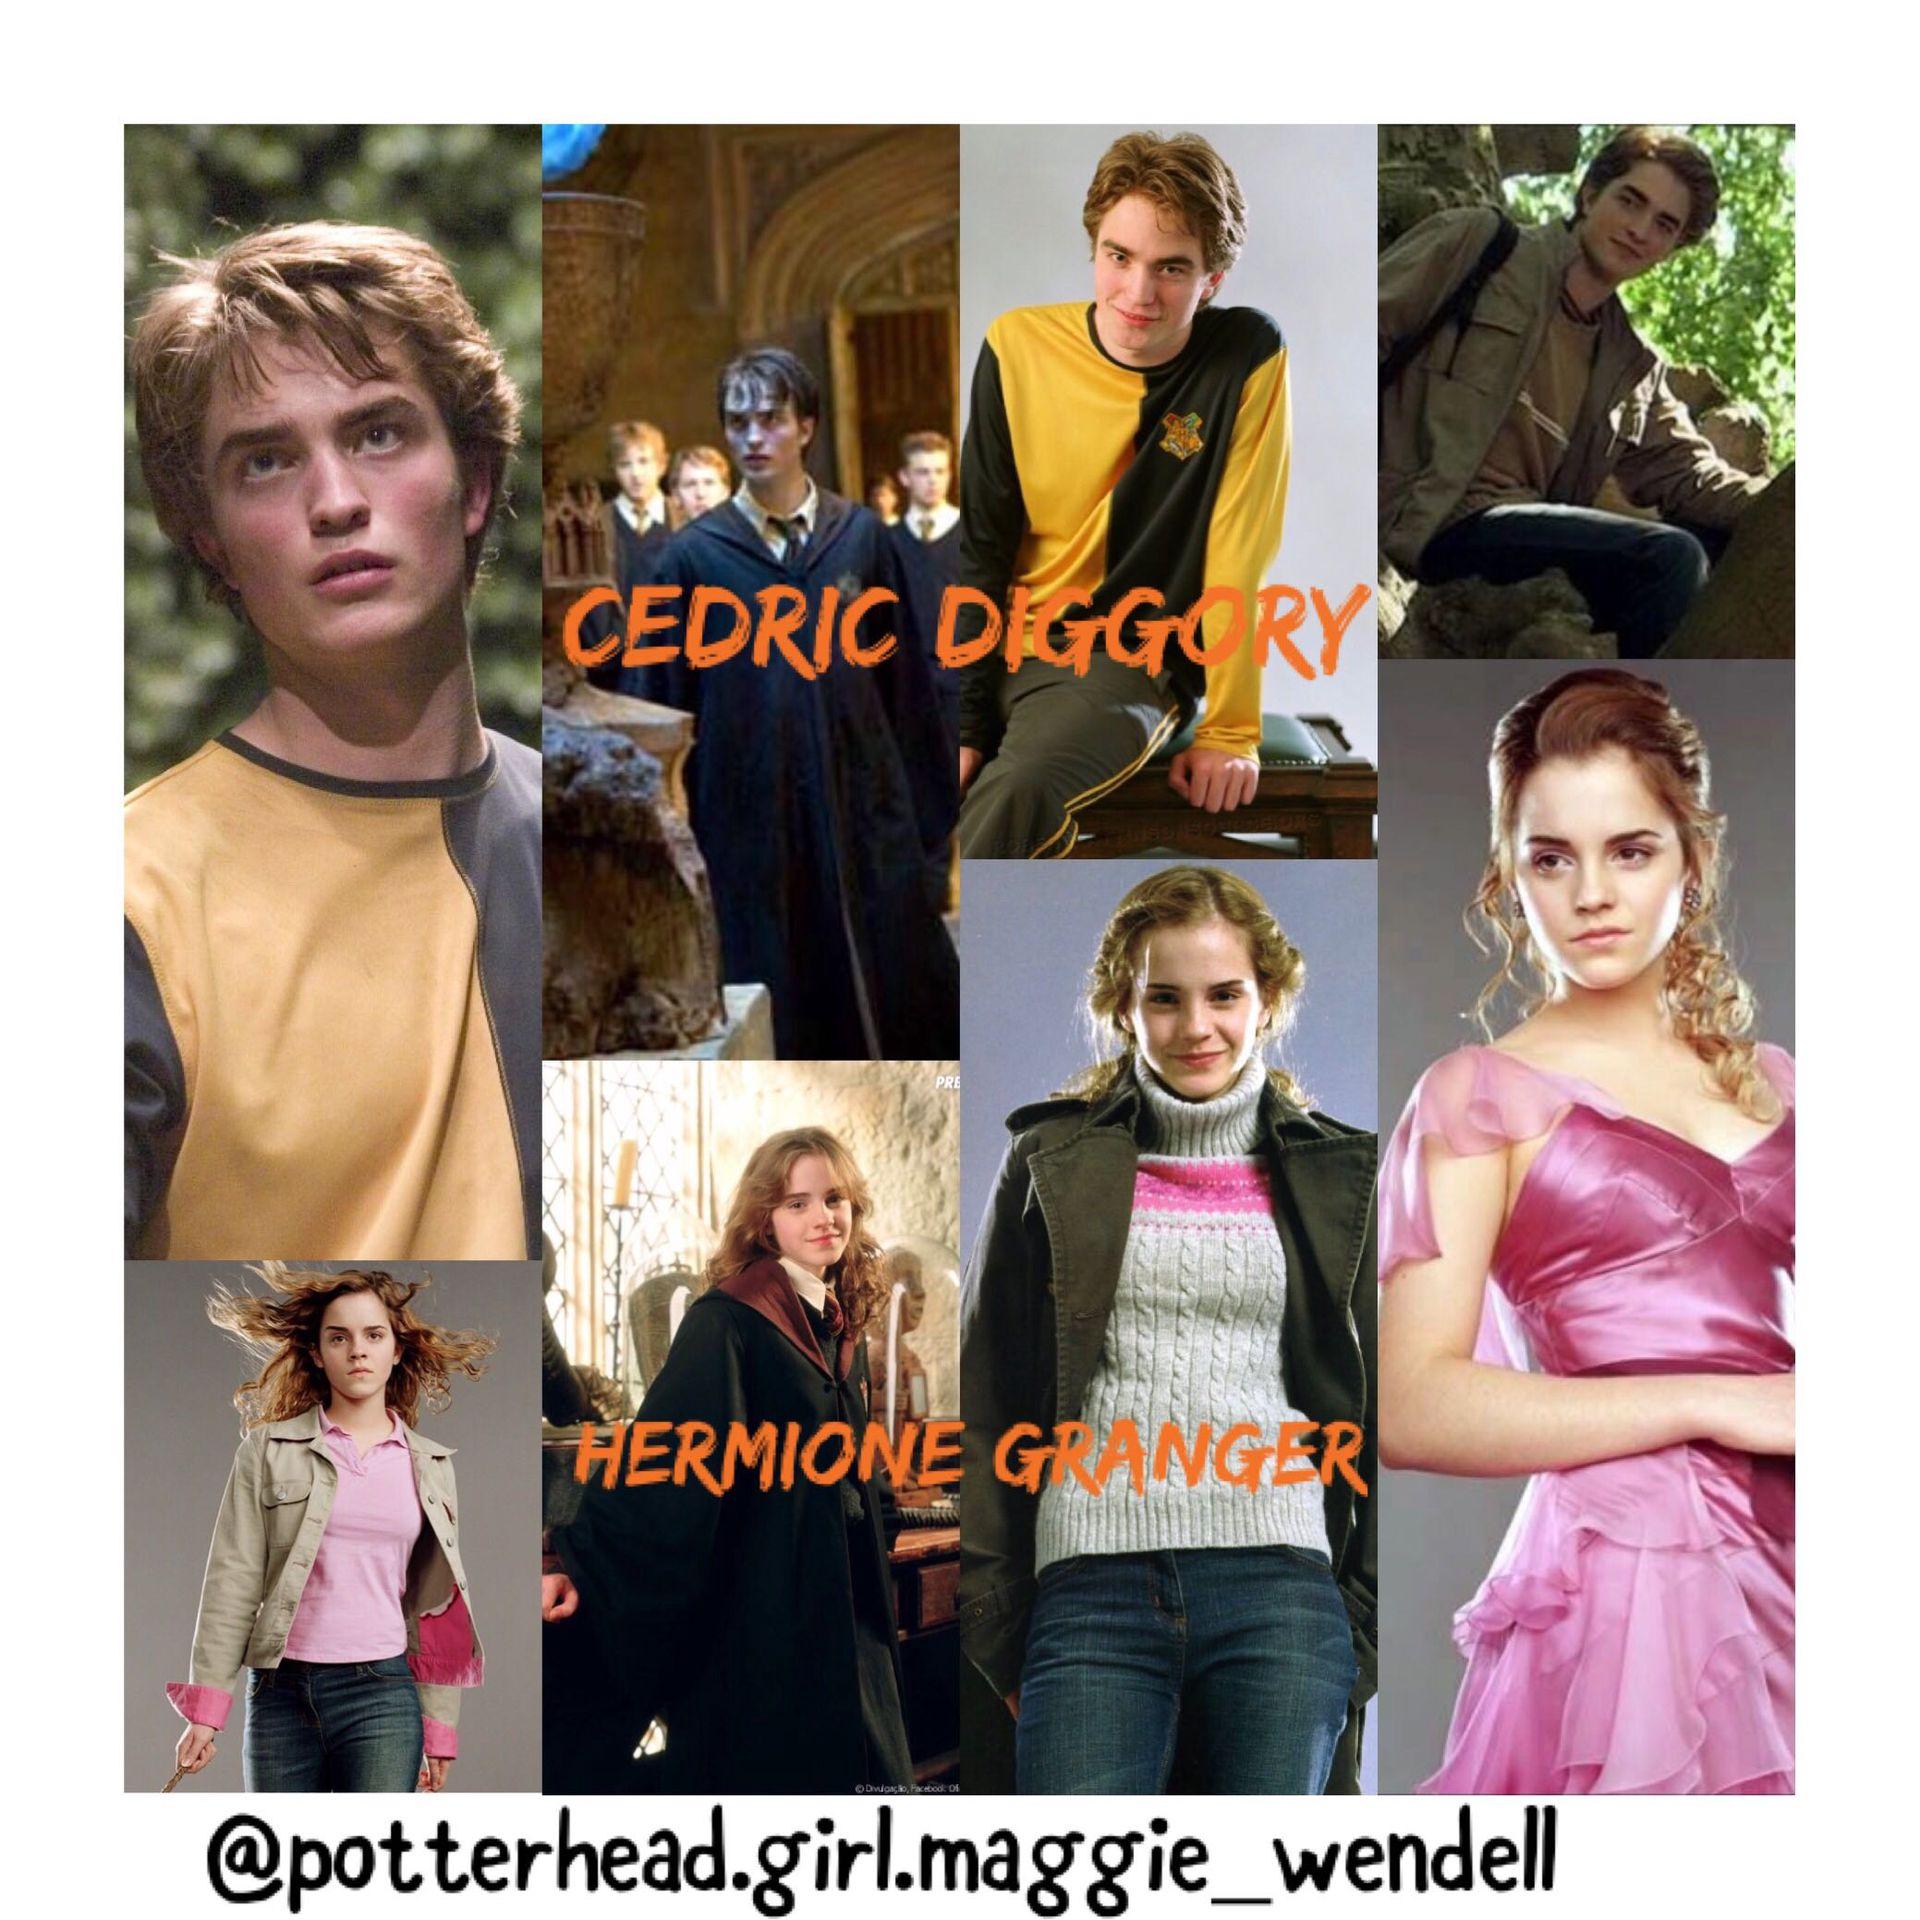 Hermione granger breasts, porn hd tv model